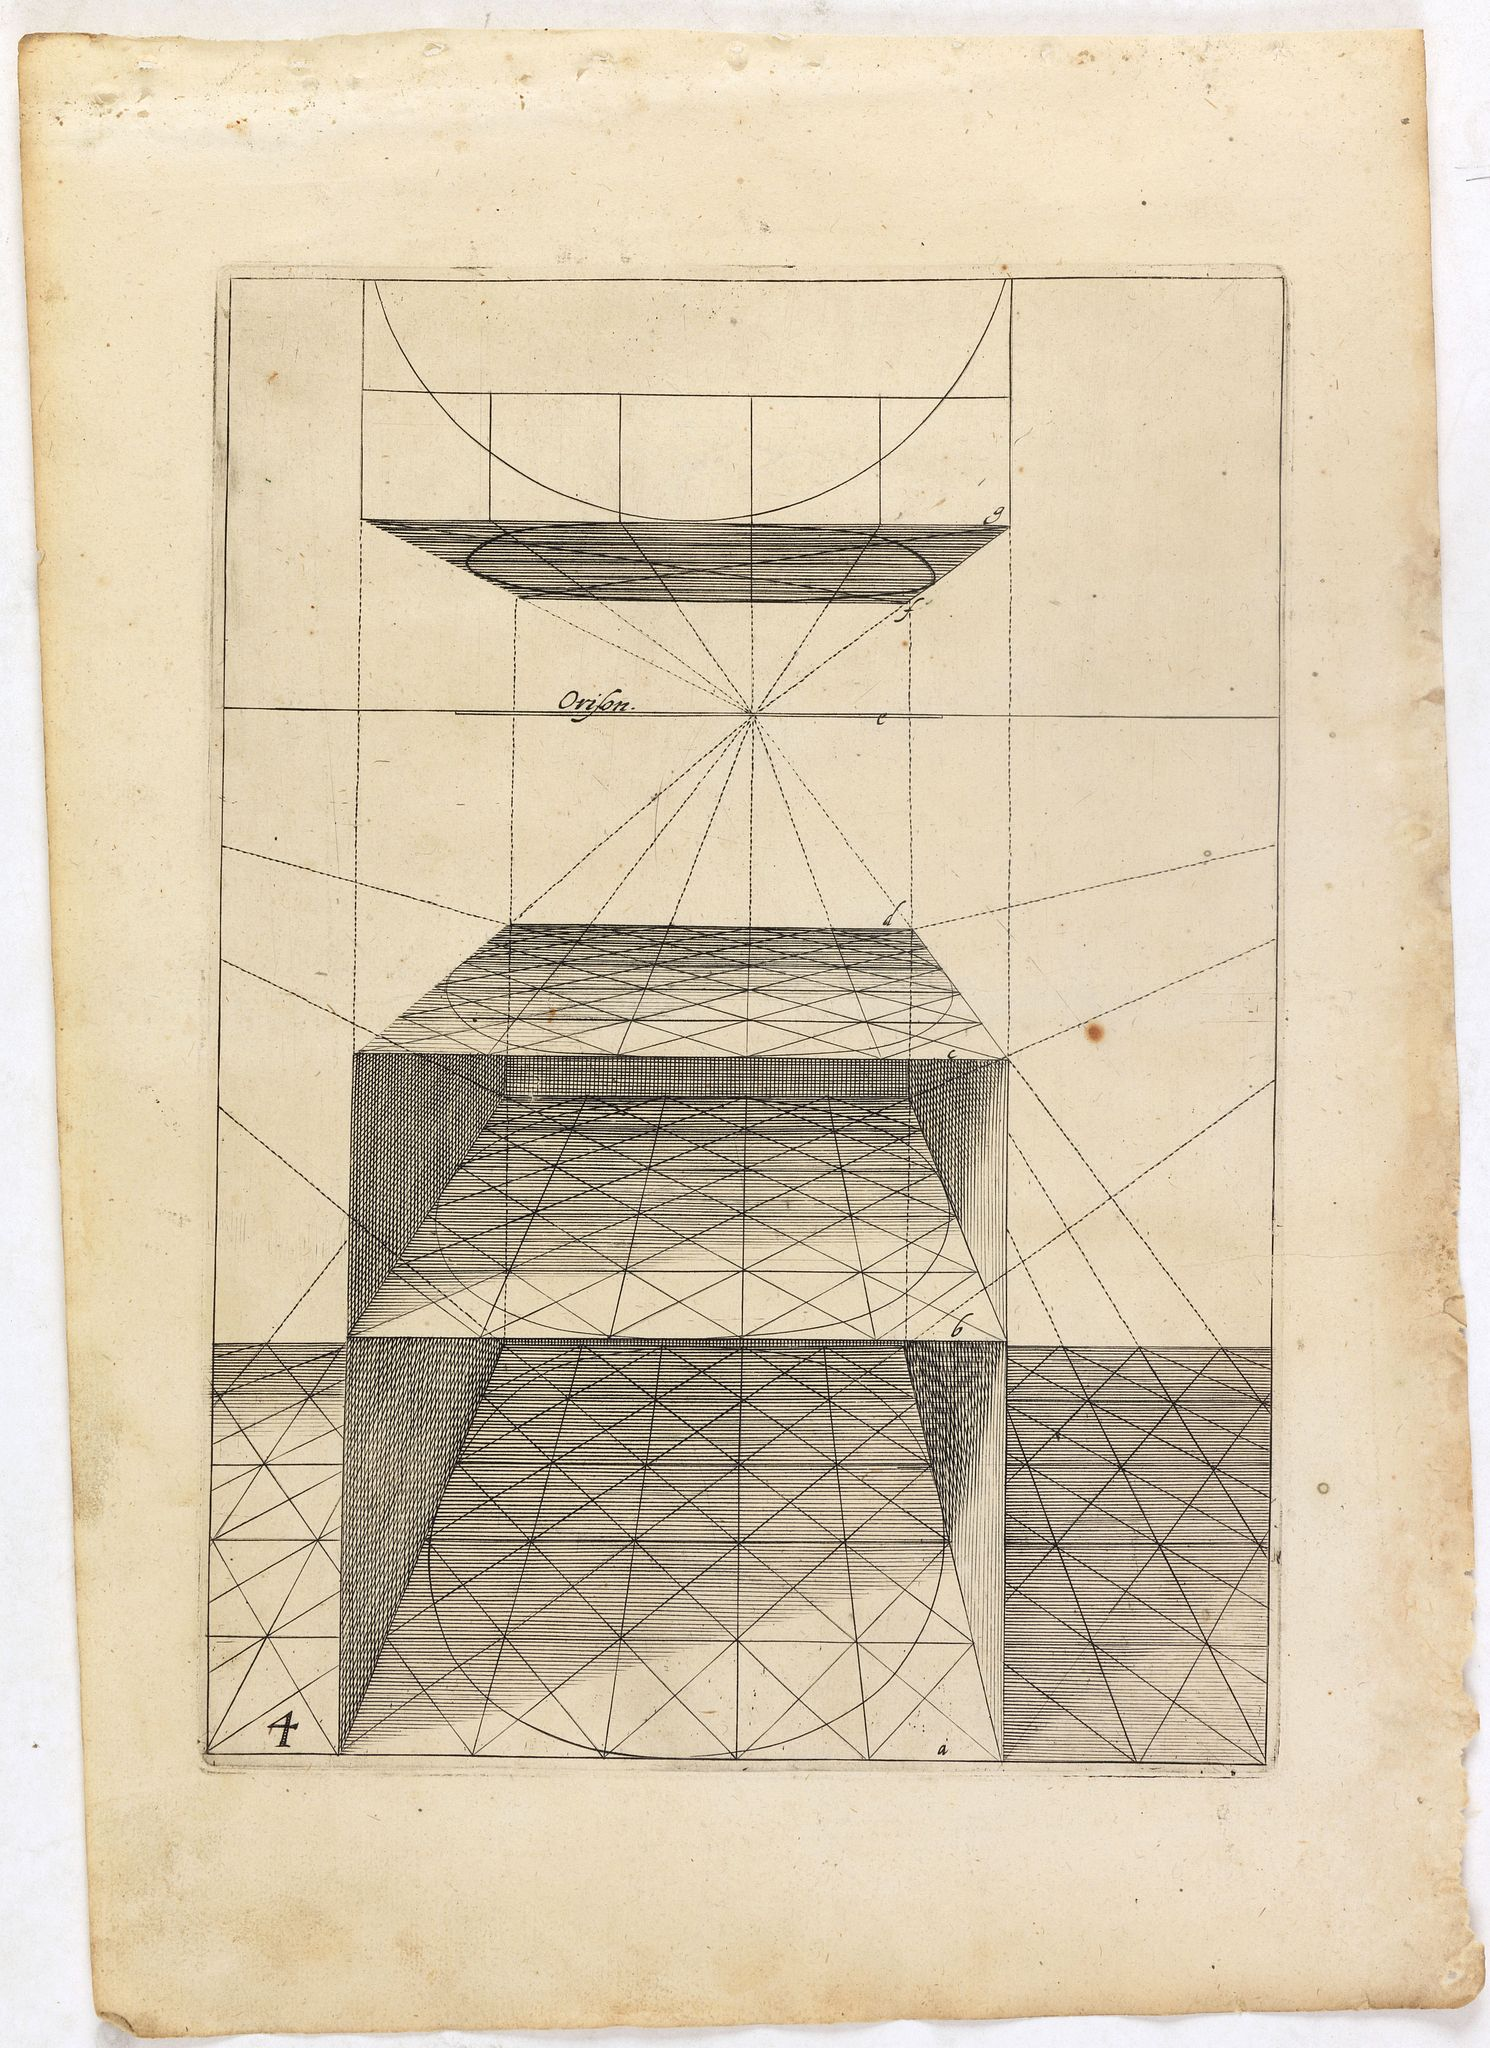 VREDEMAN DE VRIES, J. / HONDIUS, H. -  Perspective print by Vredeman de Vries. 4